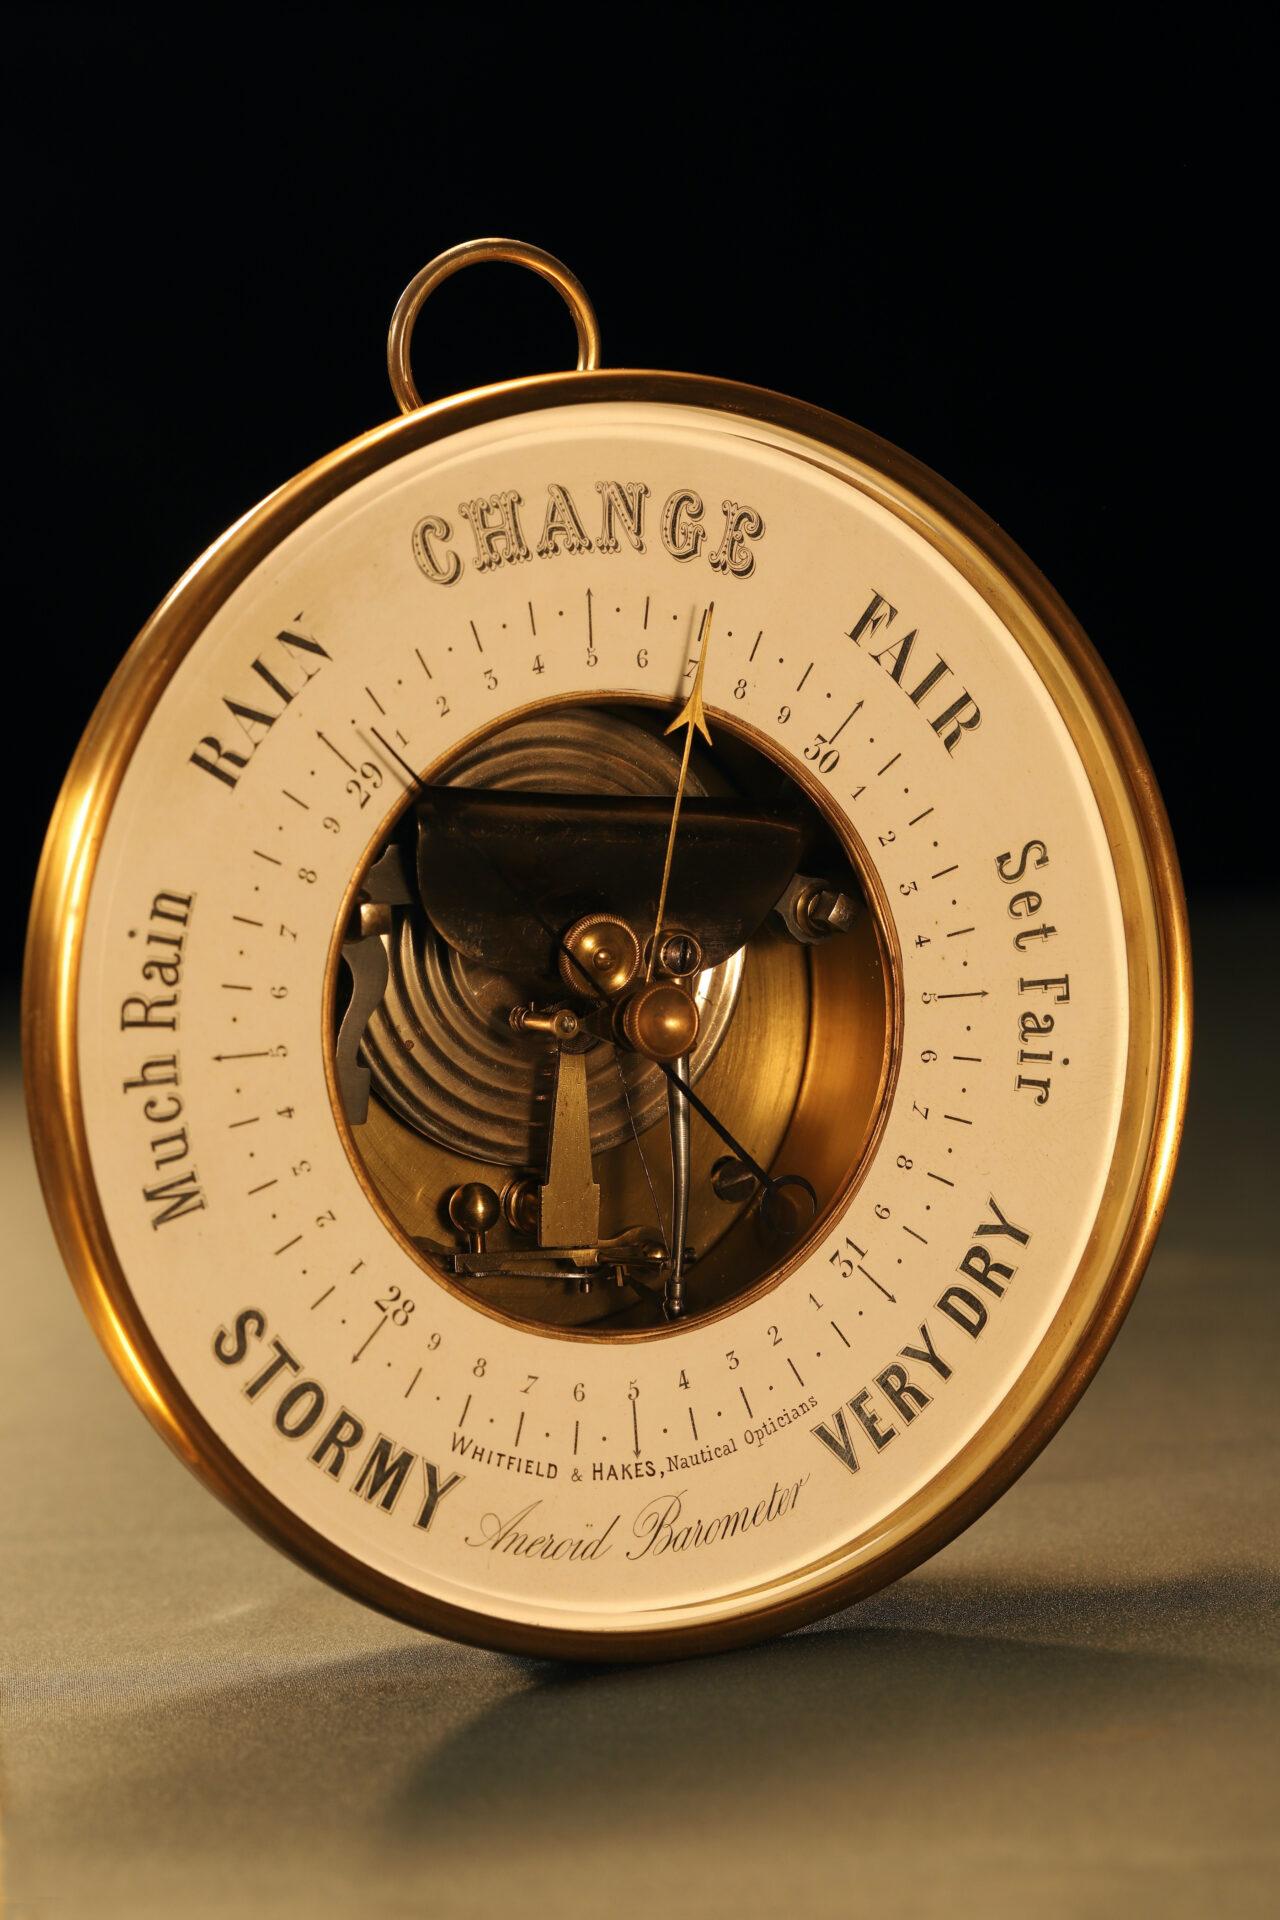 Image of Naudet Open Dial Barometer c1890 taken from lefthand side